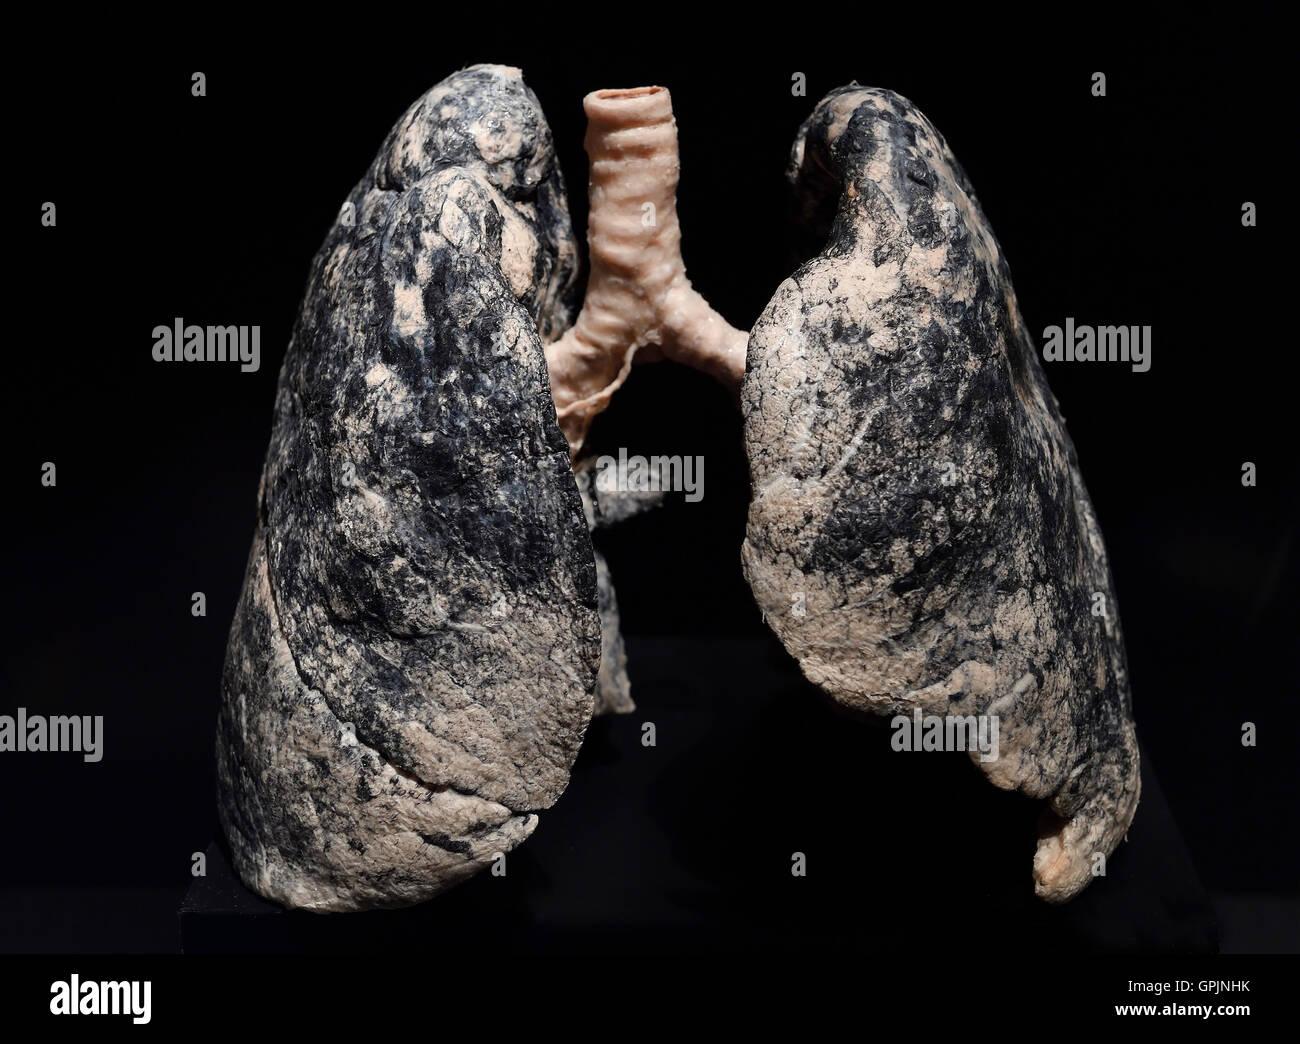 Plastinate, human lung, smoker, Body Worlds, Menschen Museum, Berlin, Germany - Stock Image